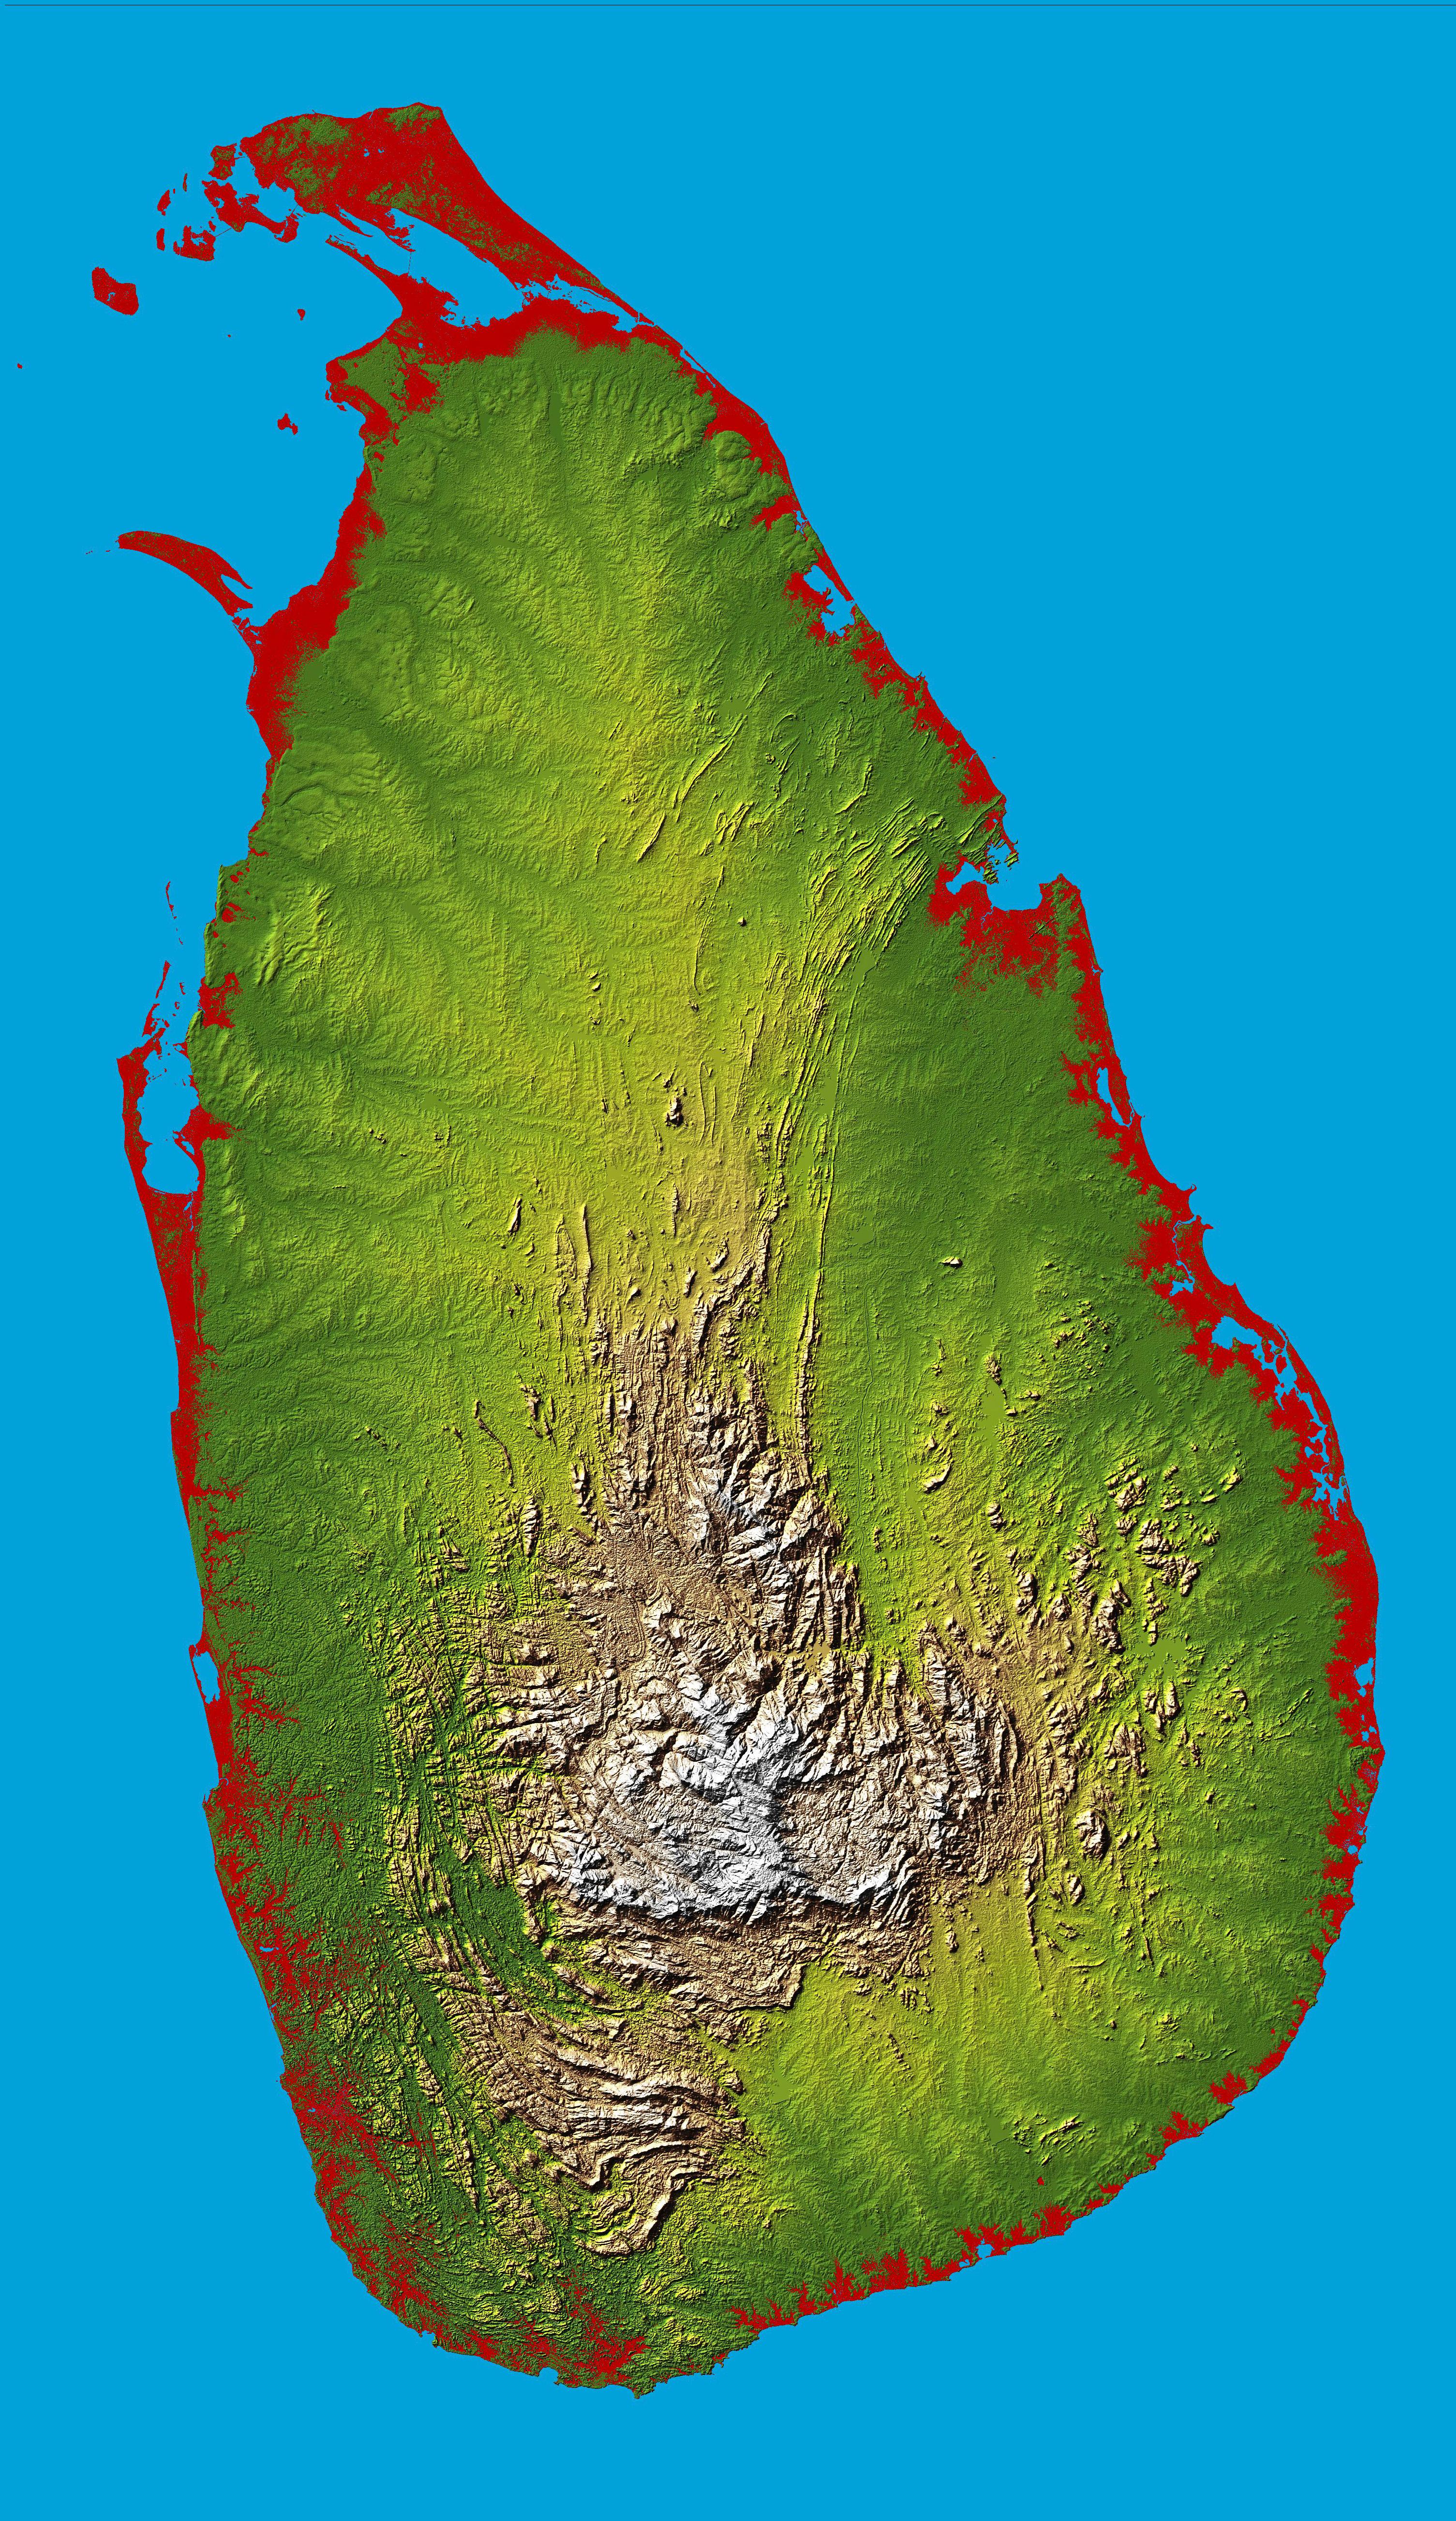 Maps of Sri Lanka | Detailed map of Sri Lanka in English | Tourist ...